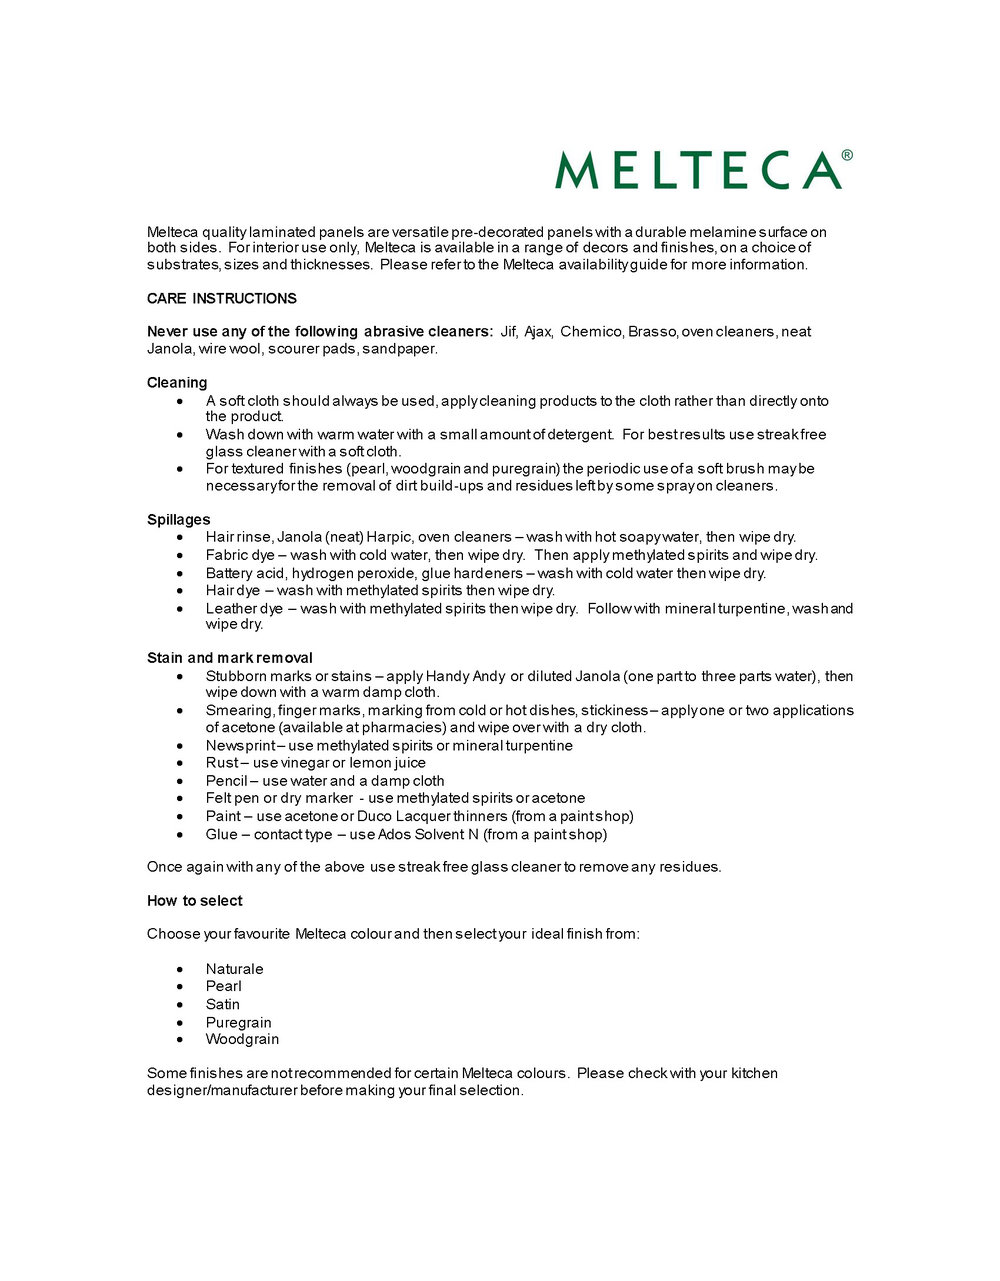 2016_Melteca_Care_Instructions.jpg